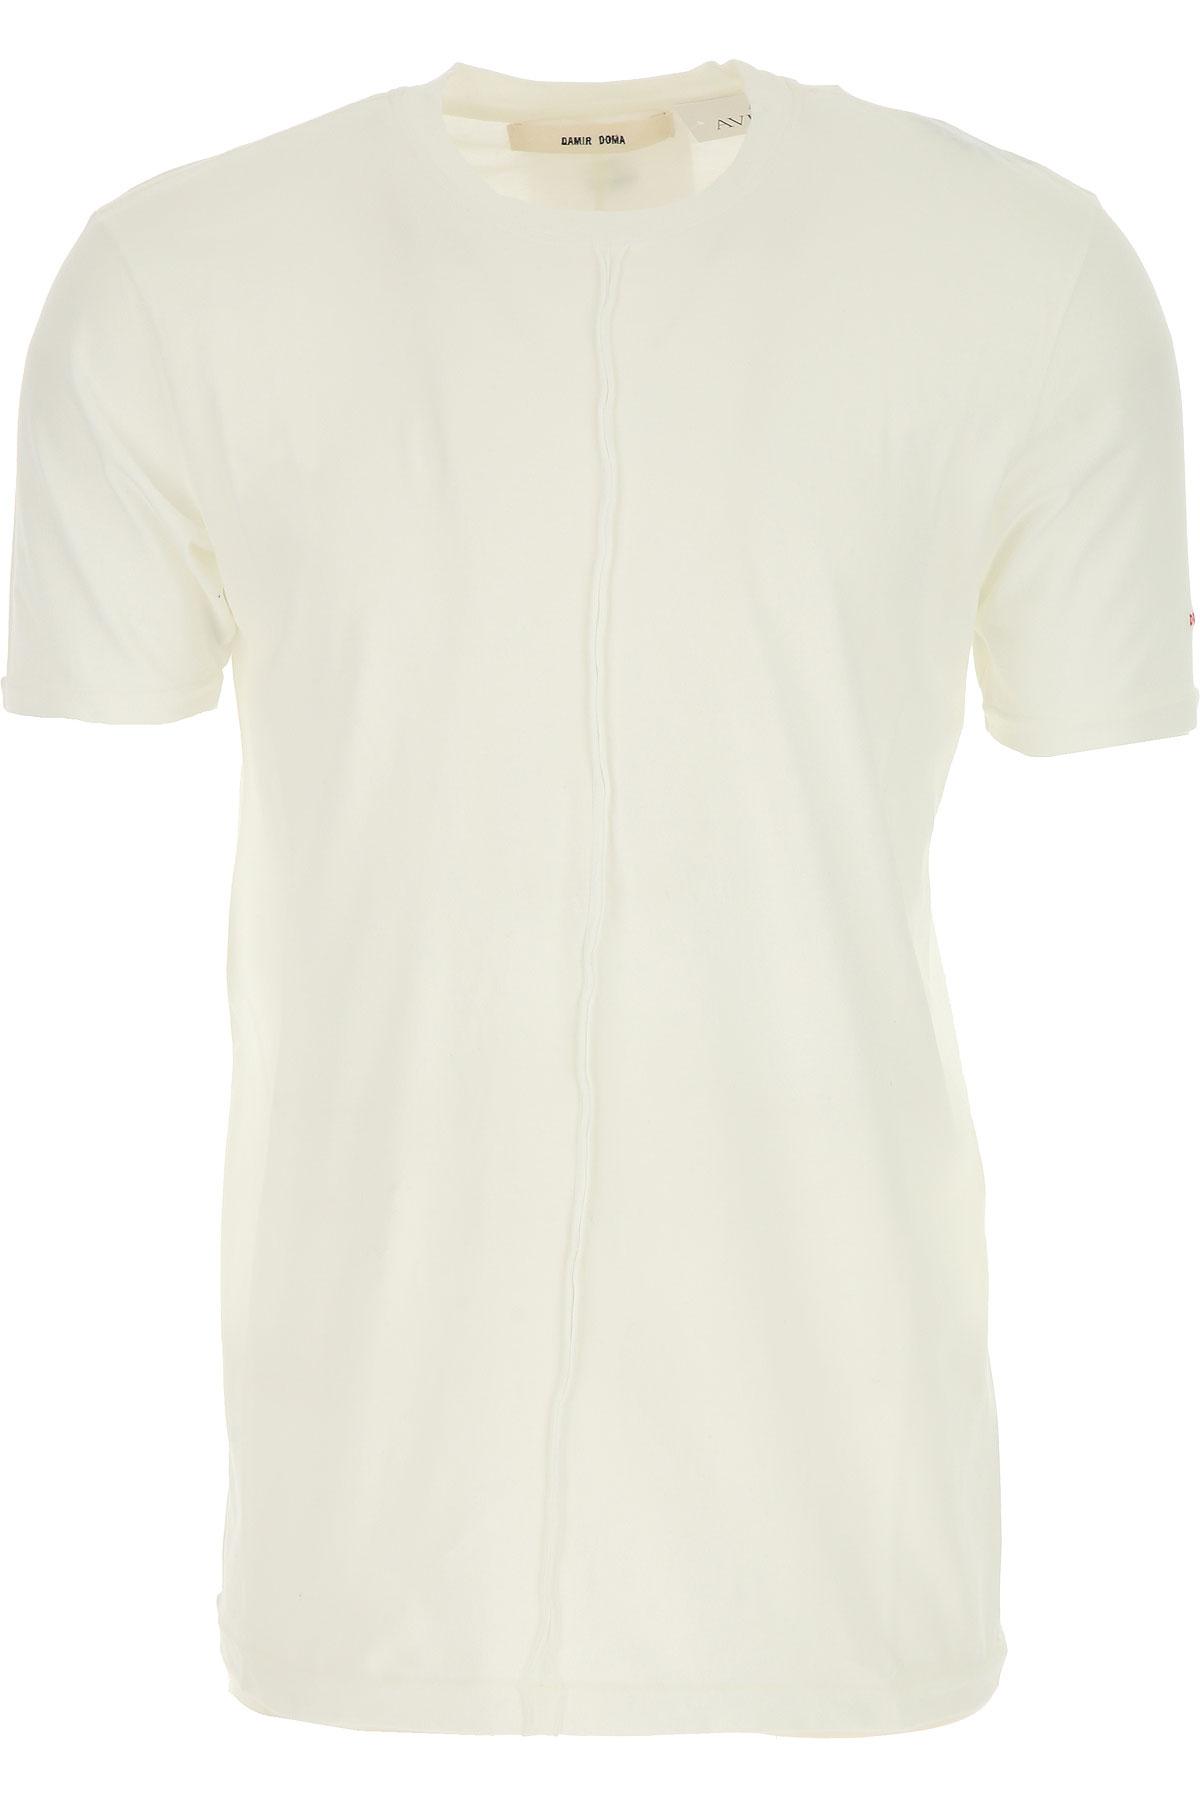 Image of Damir Doma T-Shirt for Men, White, Cotton, 2017, L M S XL